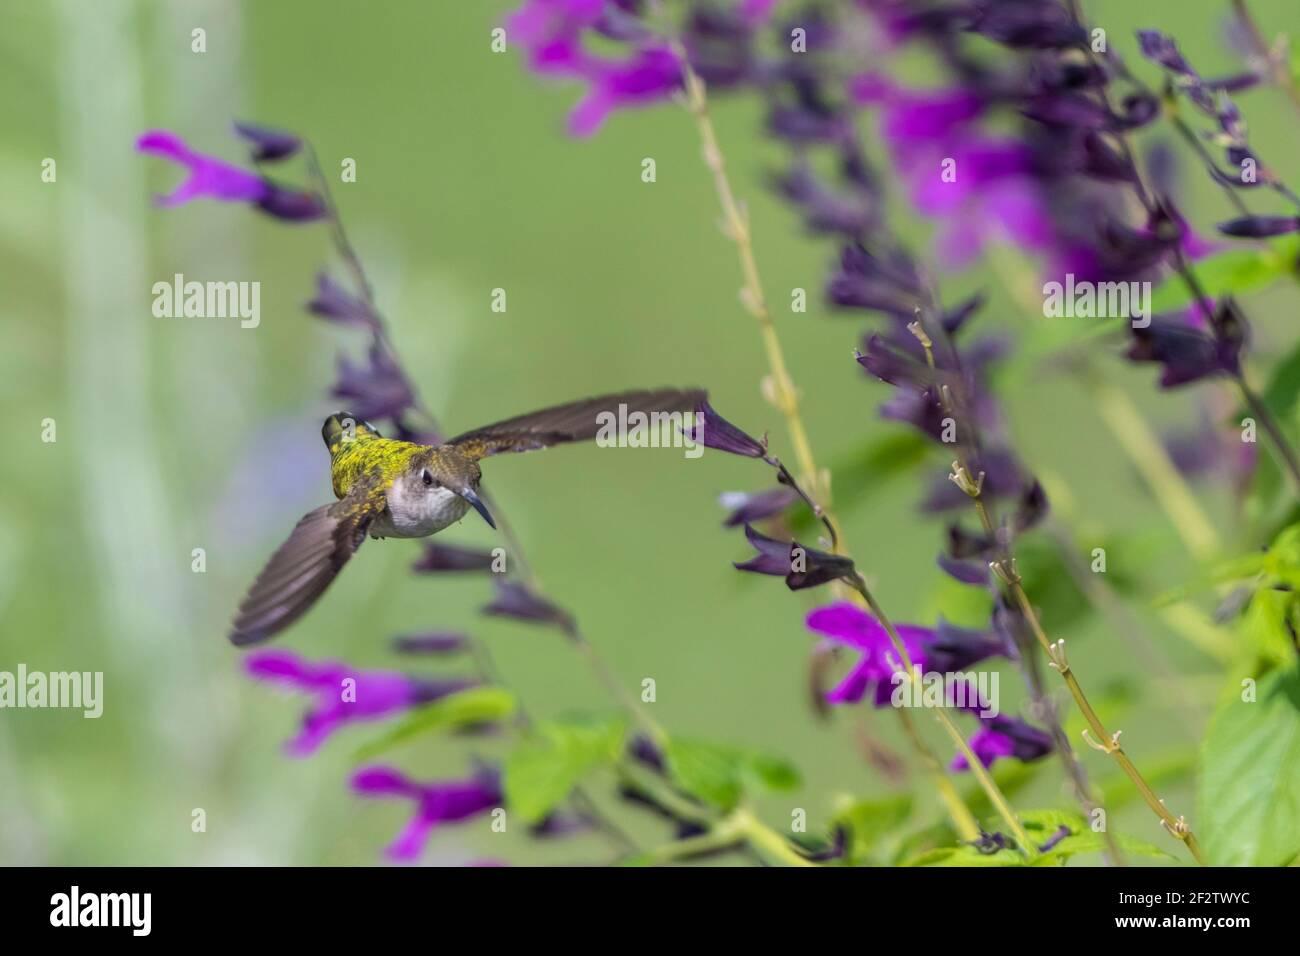 01162-16514 Rubinkehliger Kolibri (Archilochus colubris) bei Salvia 'Purple and Bloom' (Salvia Guaranitica) Marion Co. IL Stockfoto